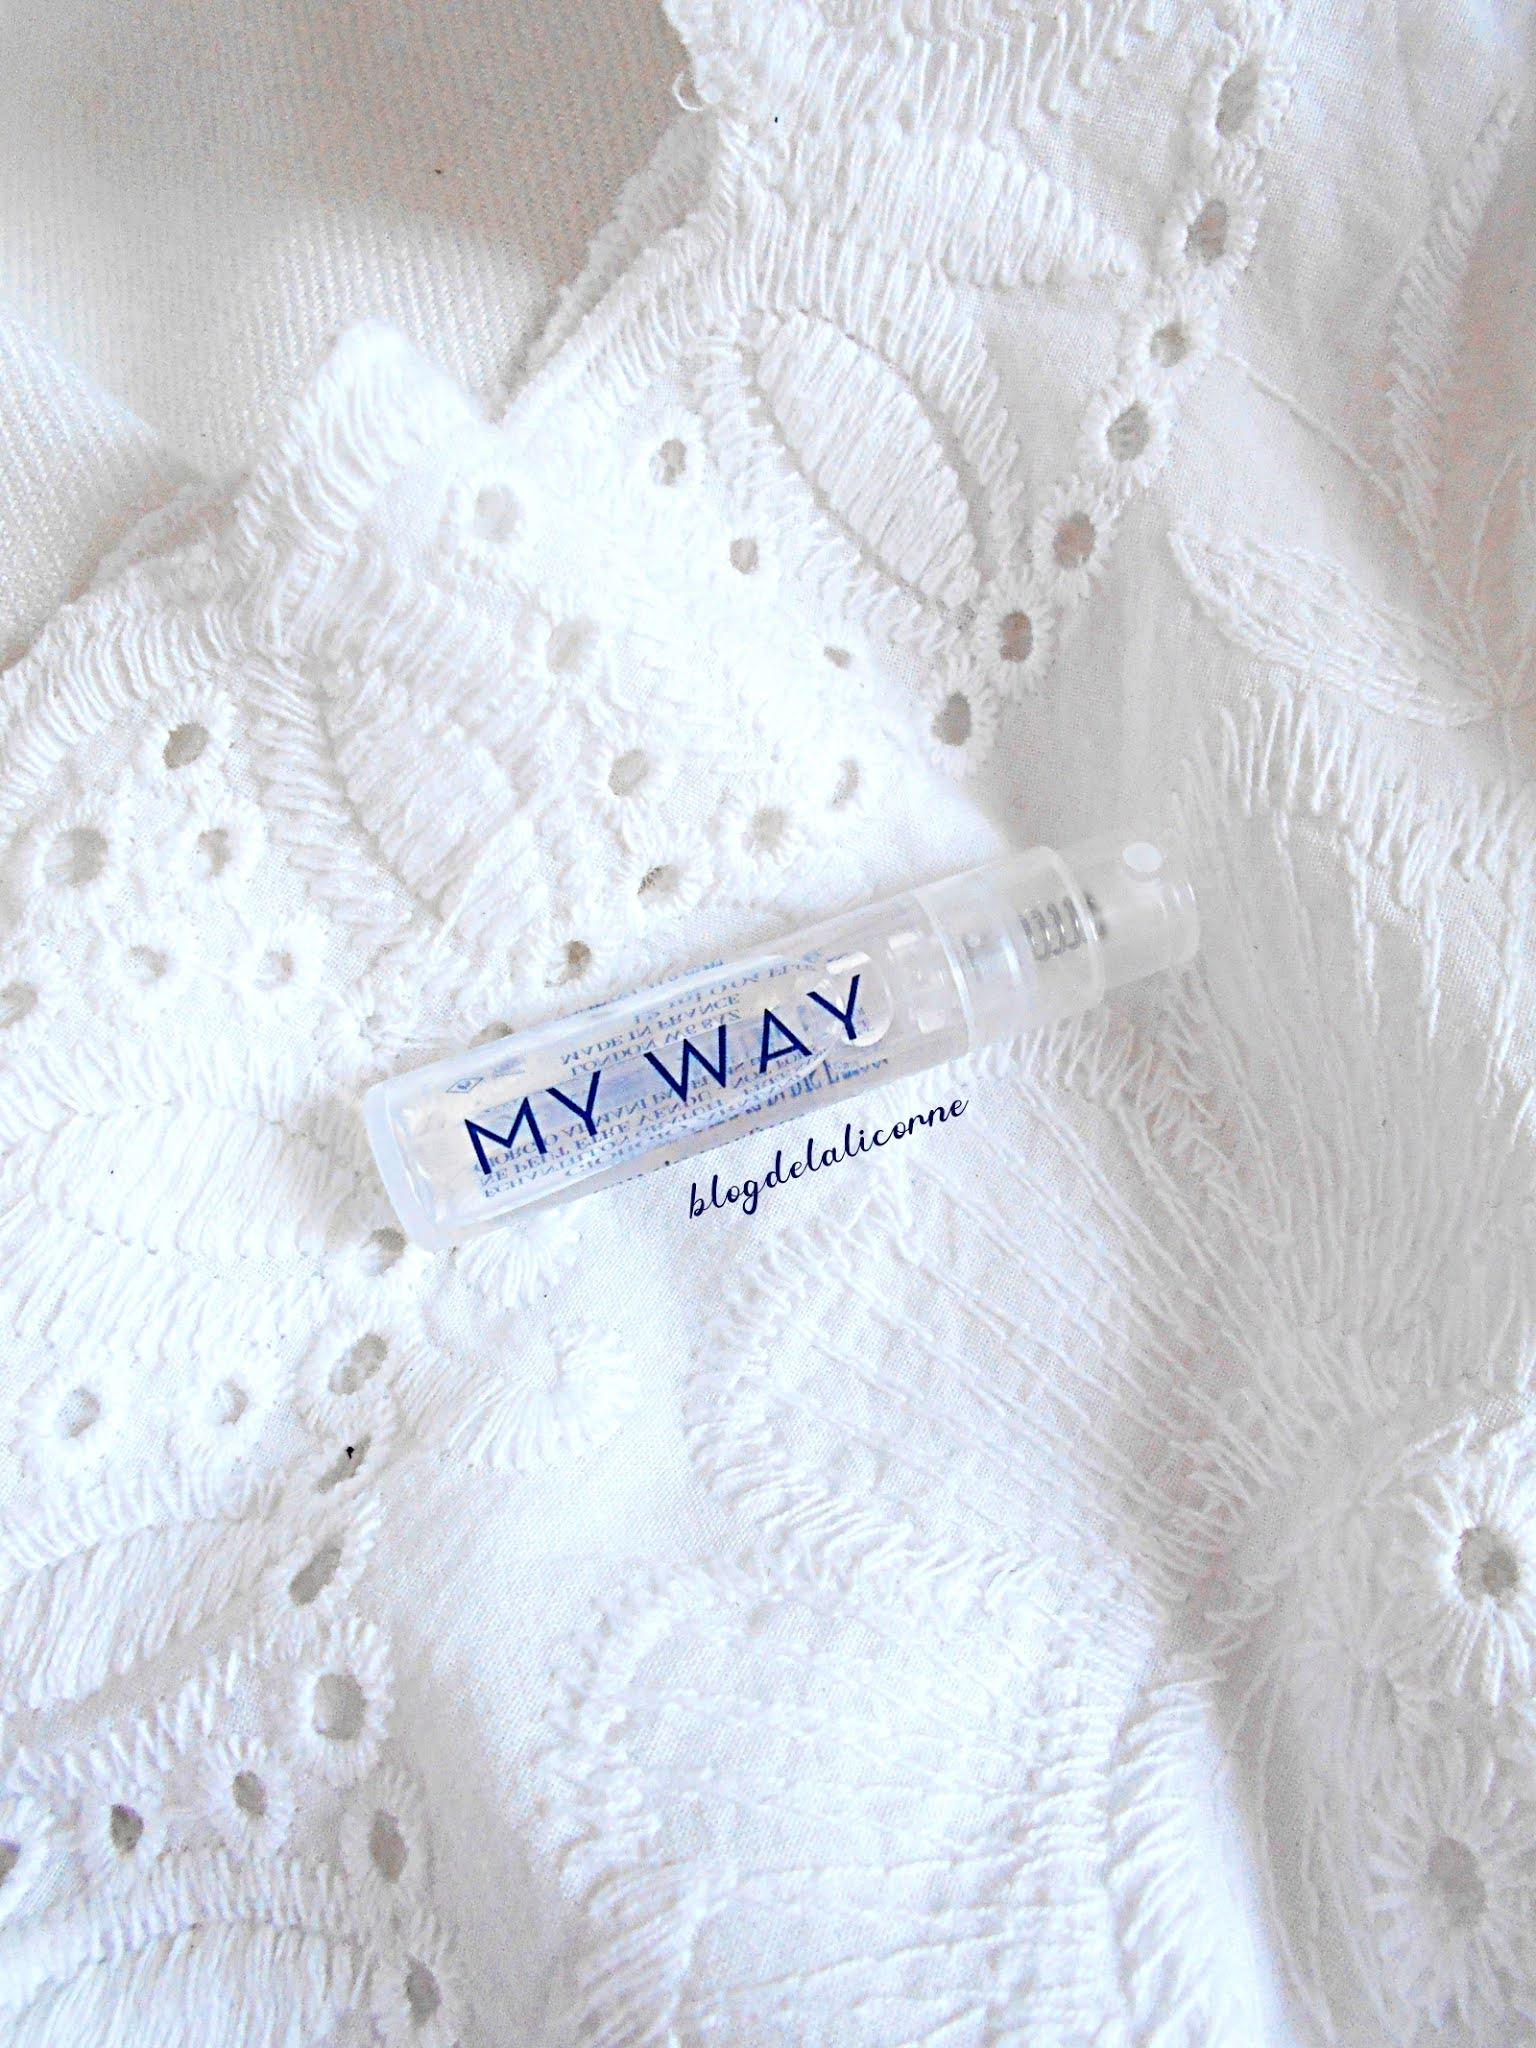 Armani My Way review